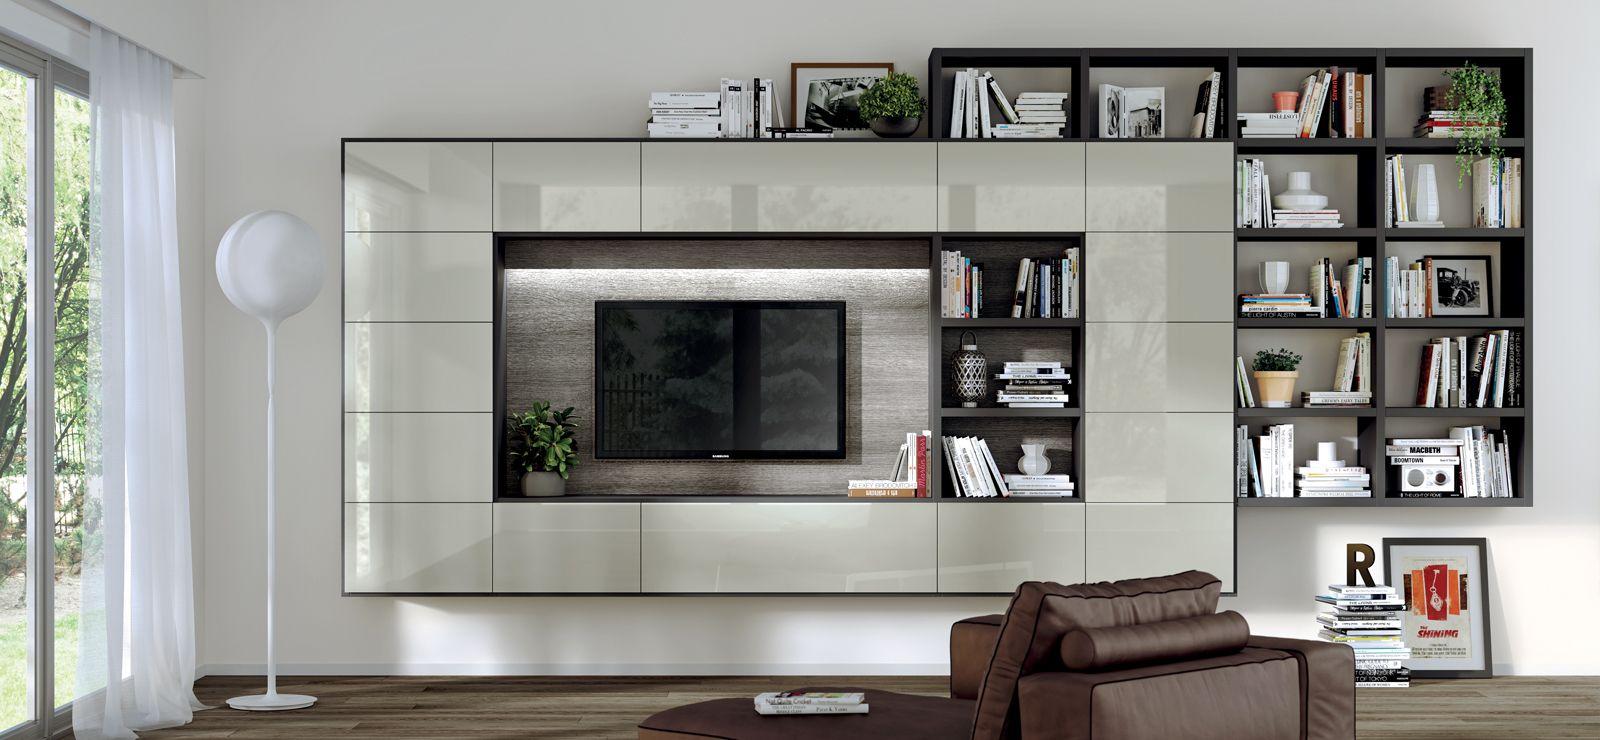 Le nostre pareti attrezzate moderne ti aspettano. Living Room Scavolini Usa Italian Living Room Decoration Ideas And Furniture Italian Living Room Minimalist Living Room Trending Decor